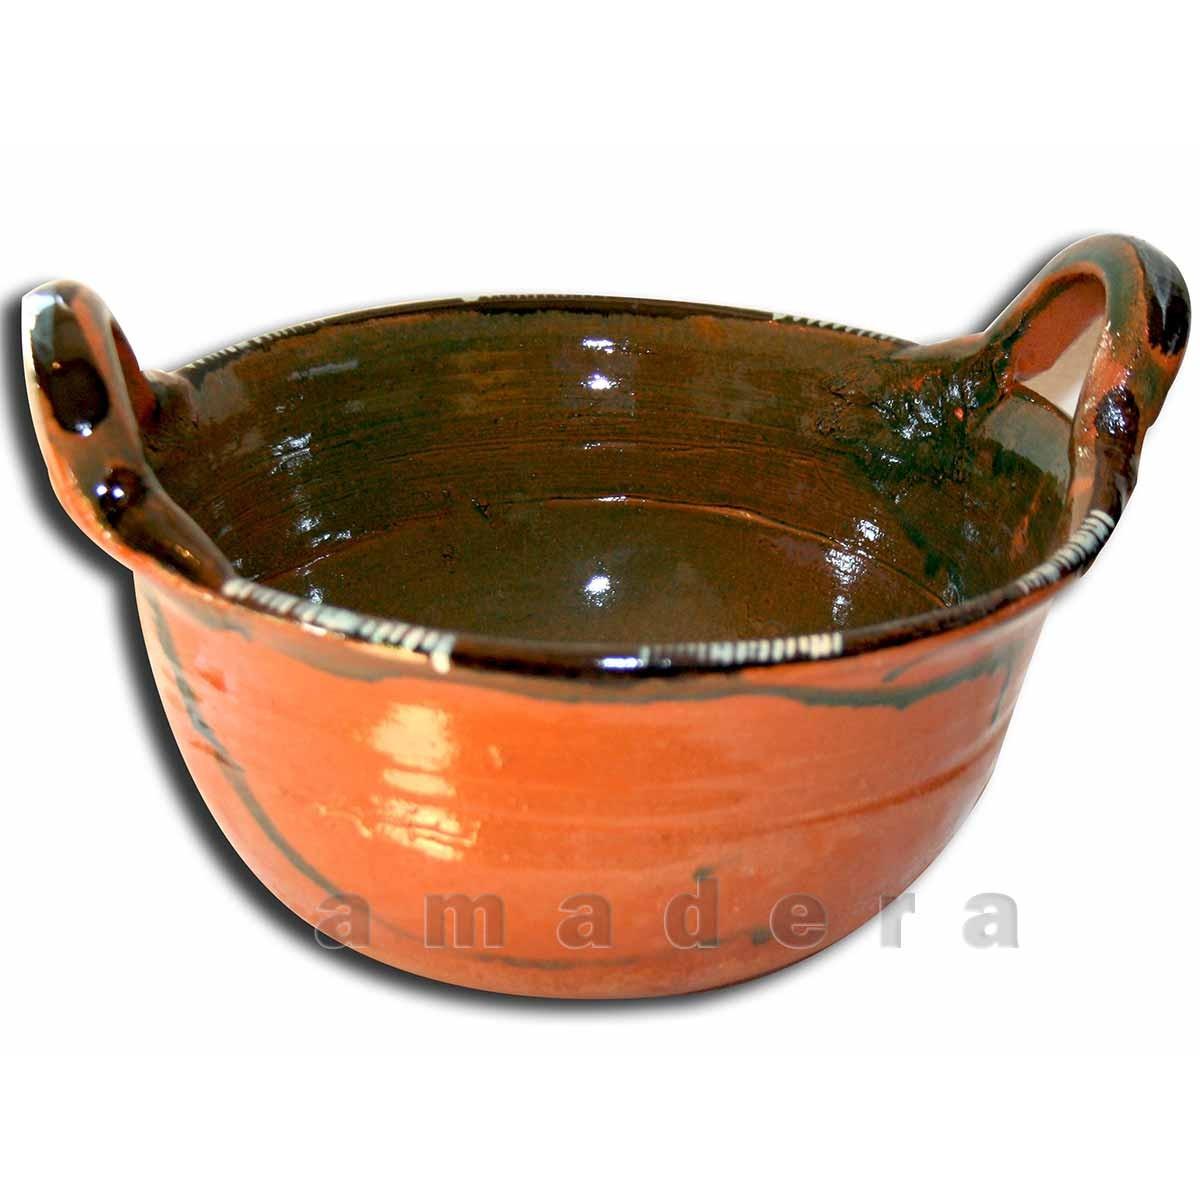 Saladier vaisselle mexicaine